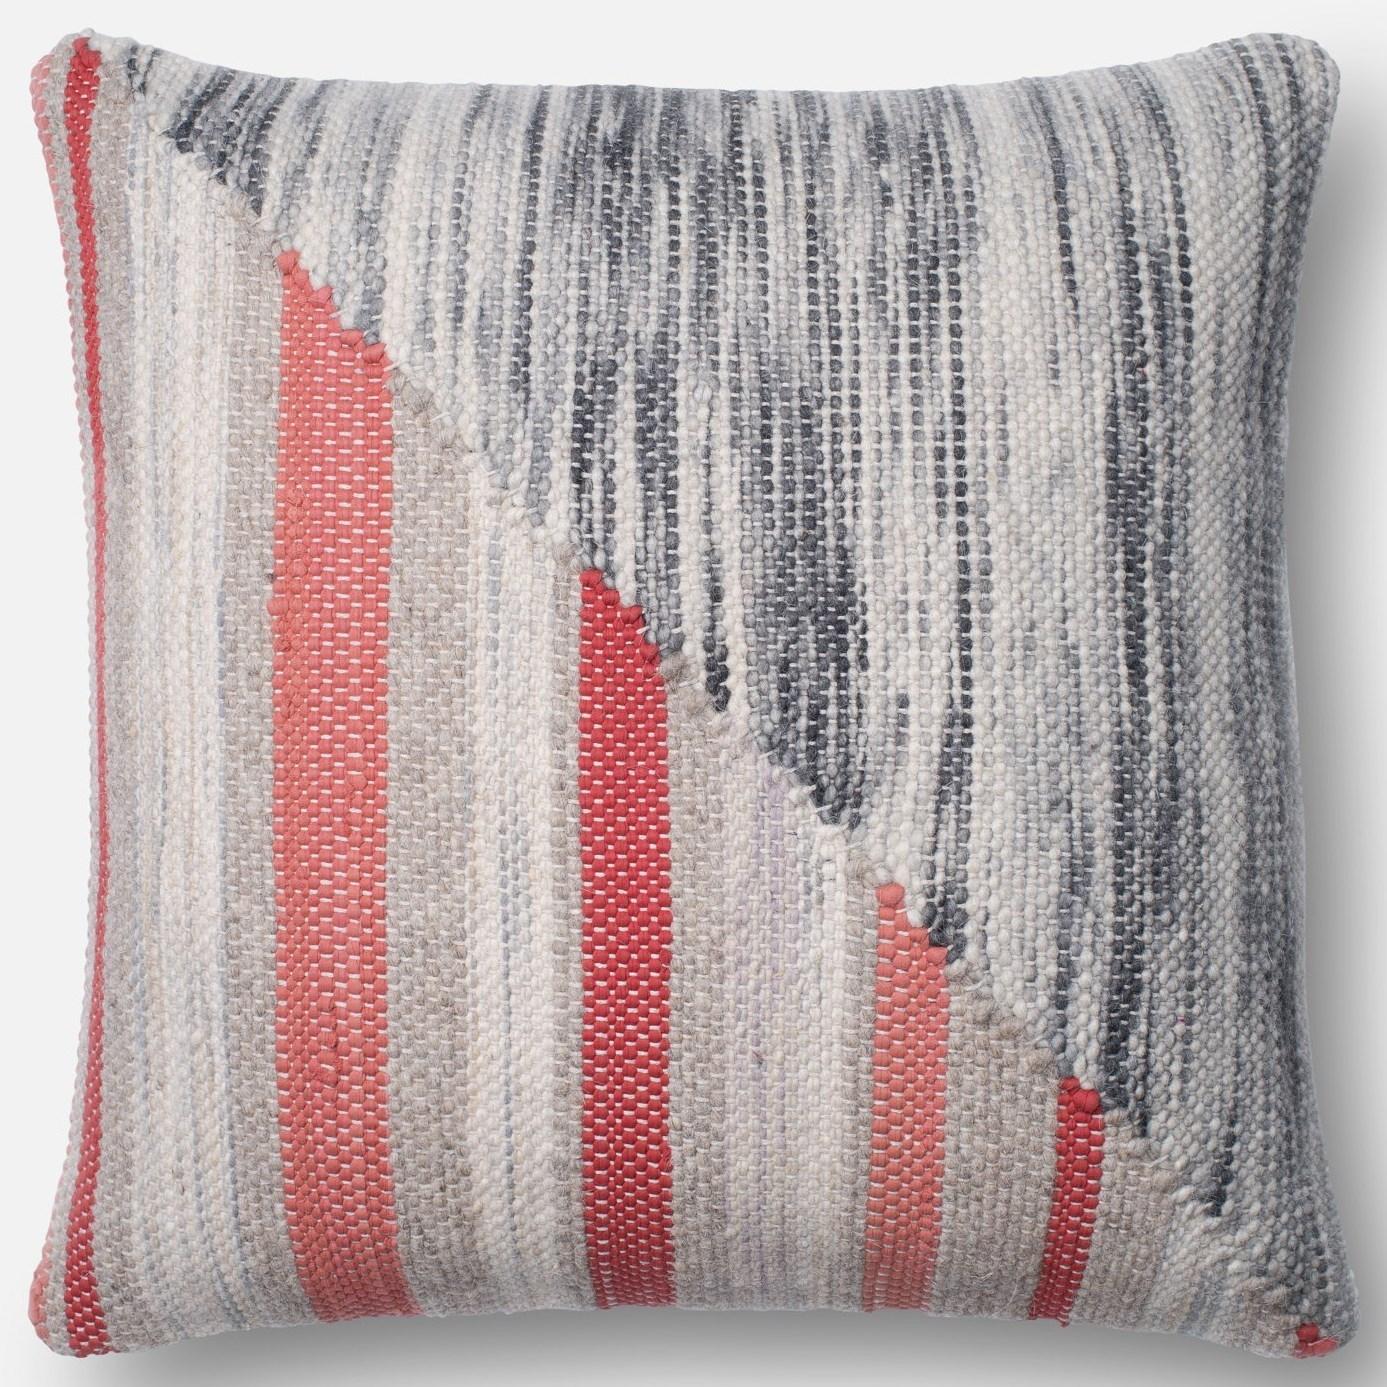 "Textured Art Silk 22"" X 22"" Down Pillow by Loloi Rugs at Pedigo Furniture"